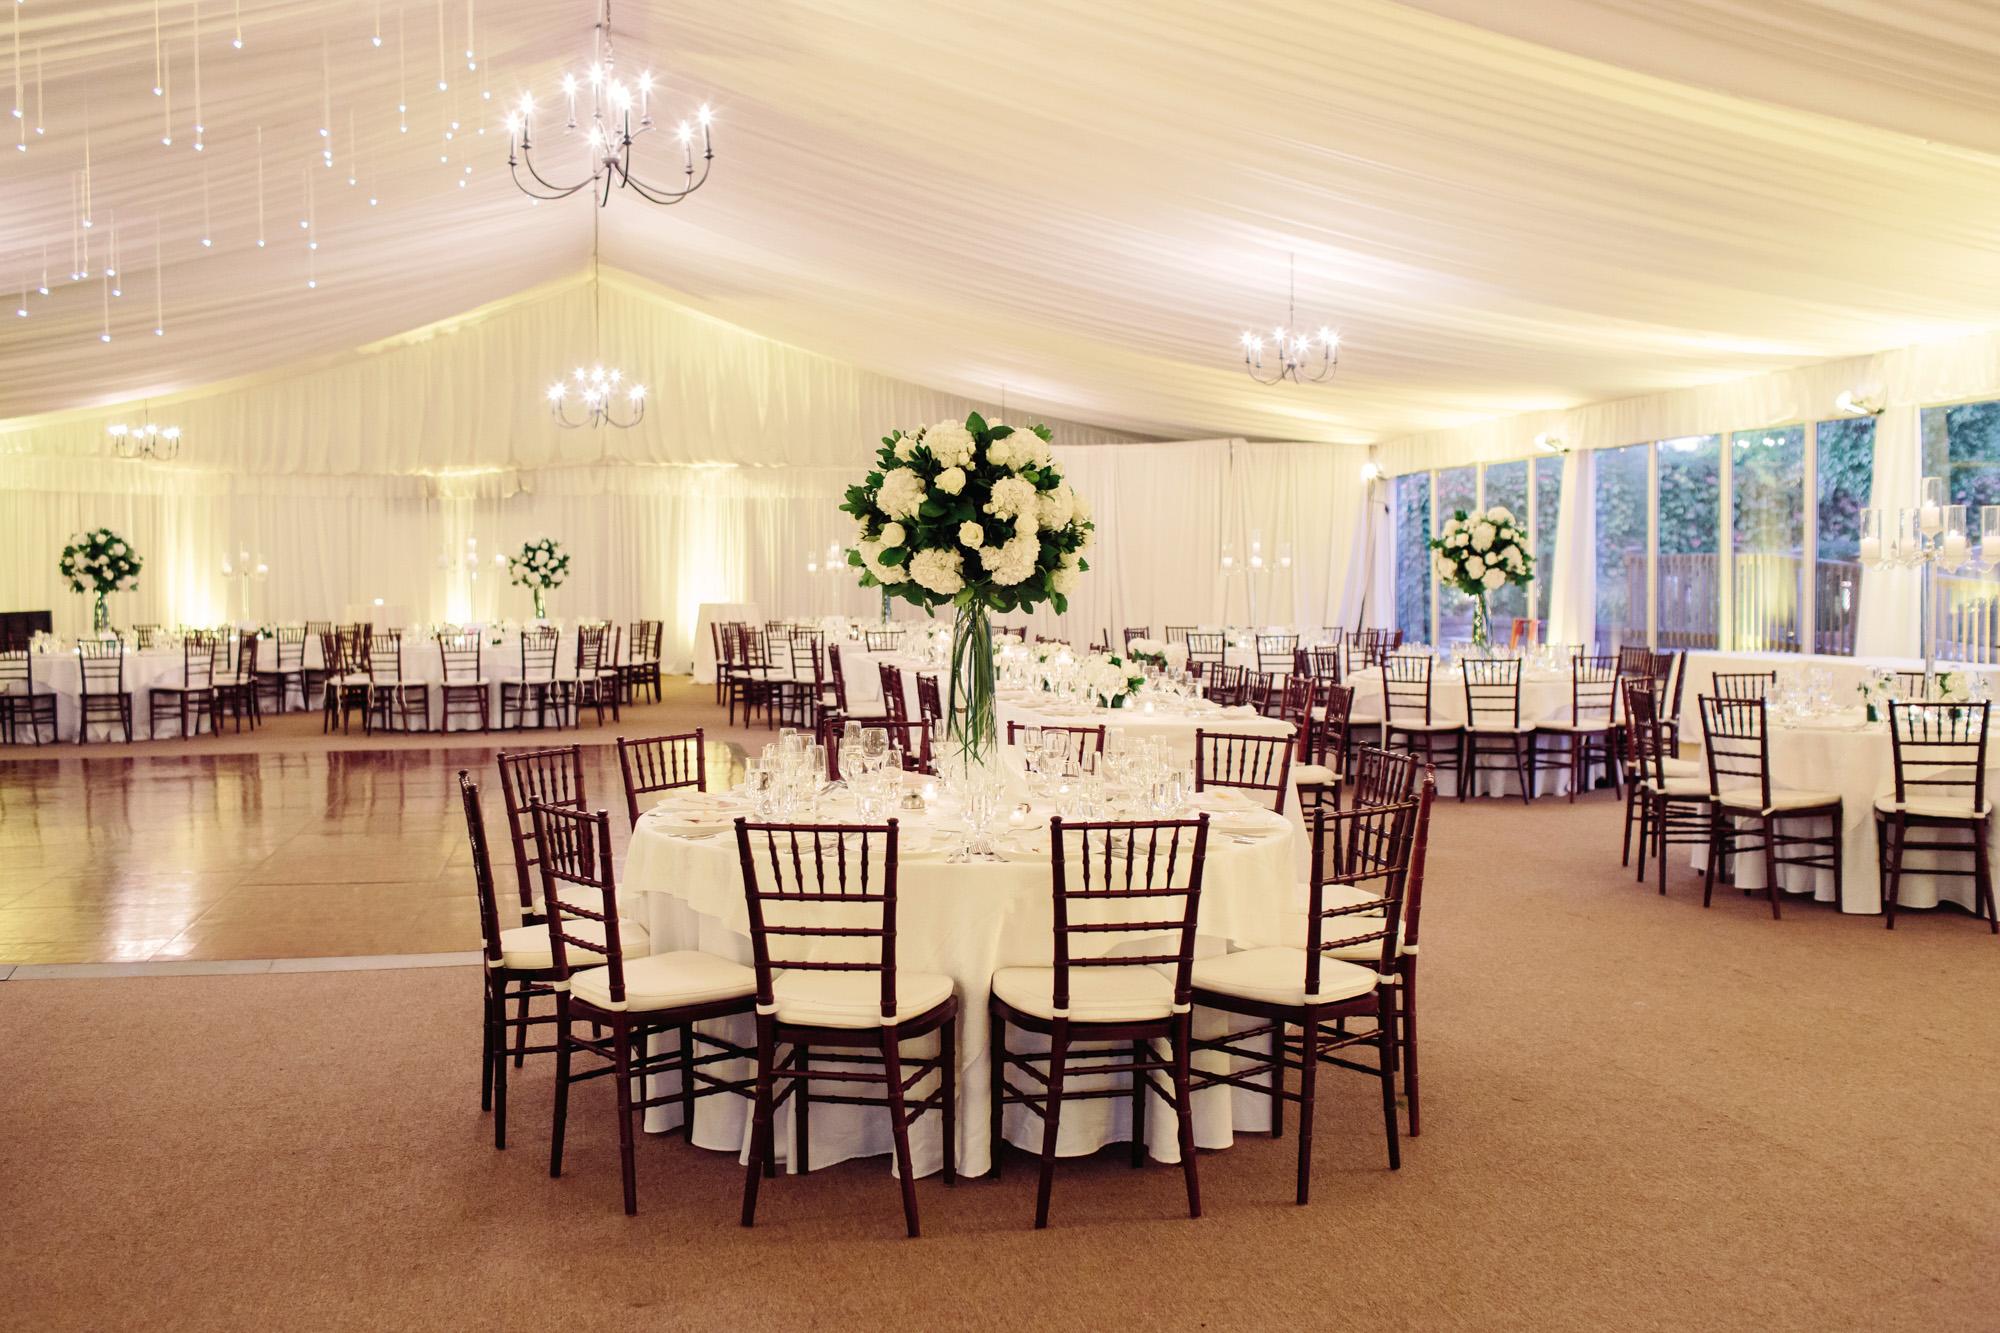 54_Christina_Daniel_Hamilton_Farm_Golf_Club_Wedding_NJ_Tanya_Salazar_Photography_1321.jpg